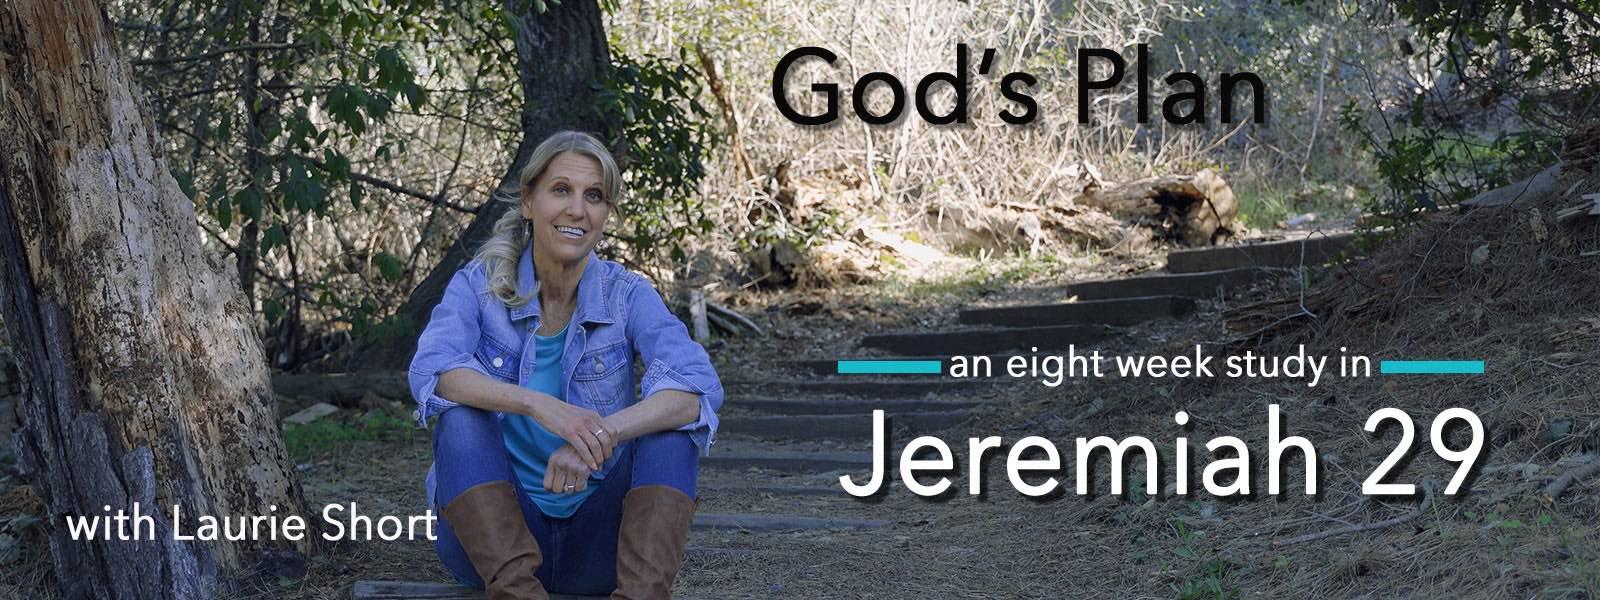 God's Plan: A Study in Jeremiah 29